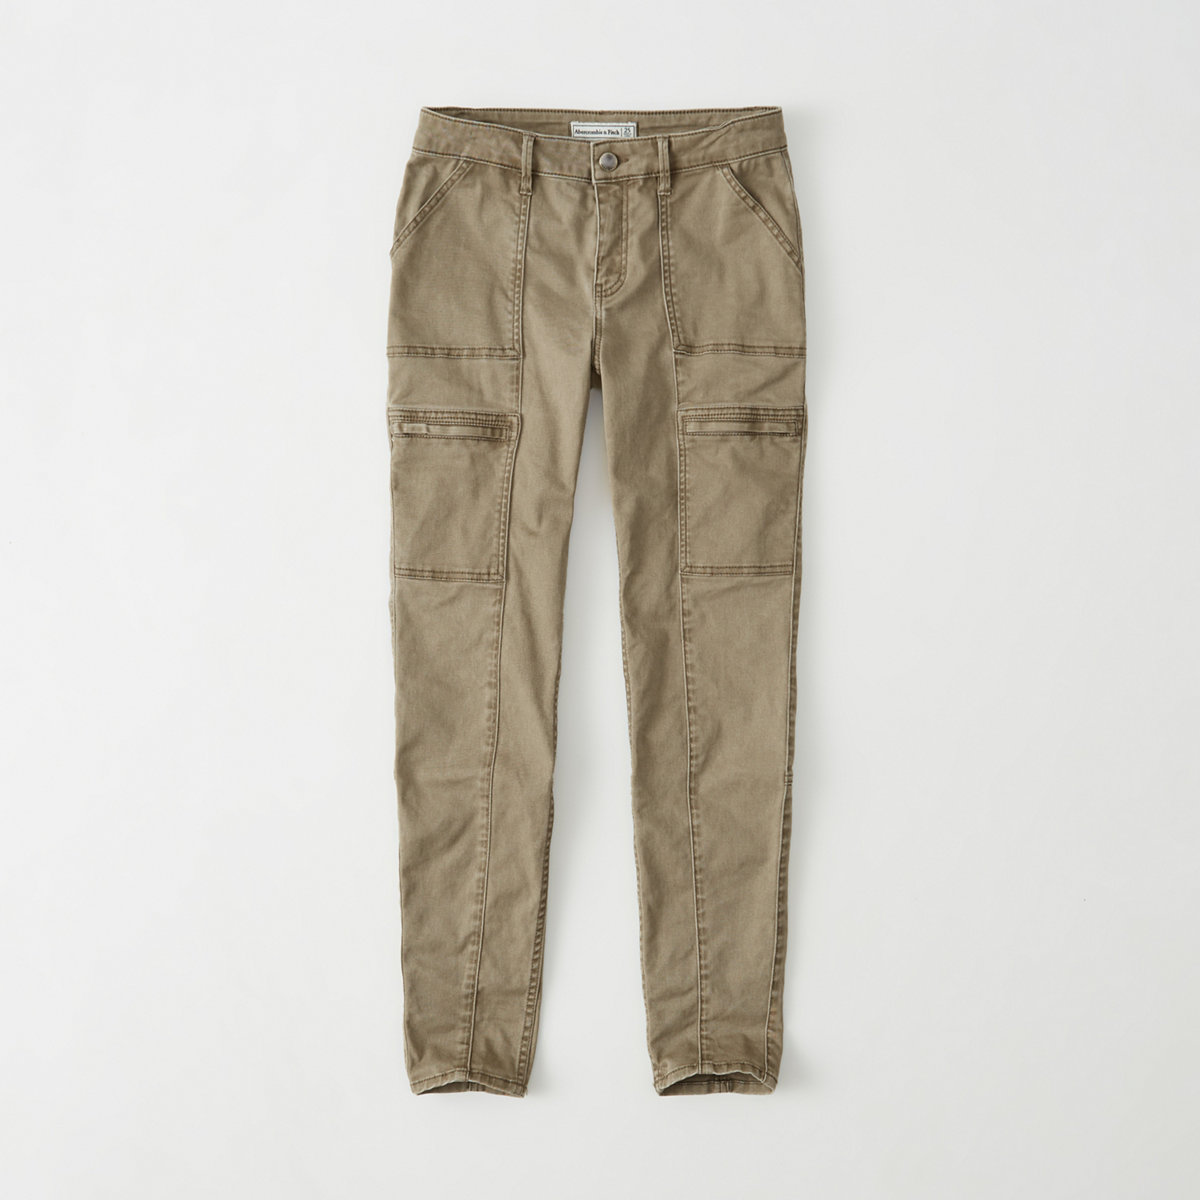 Military Super Skinny Jeans